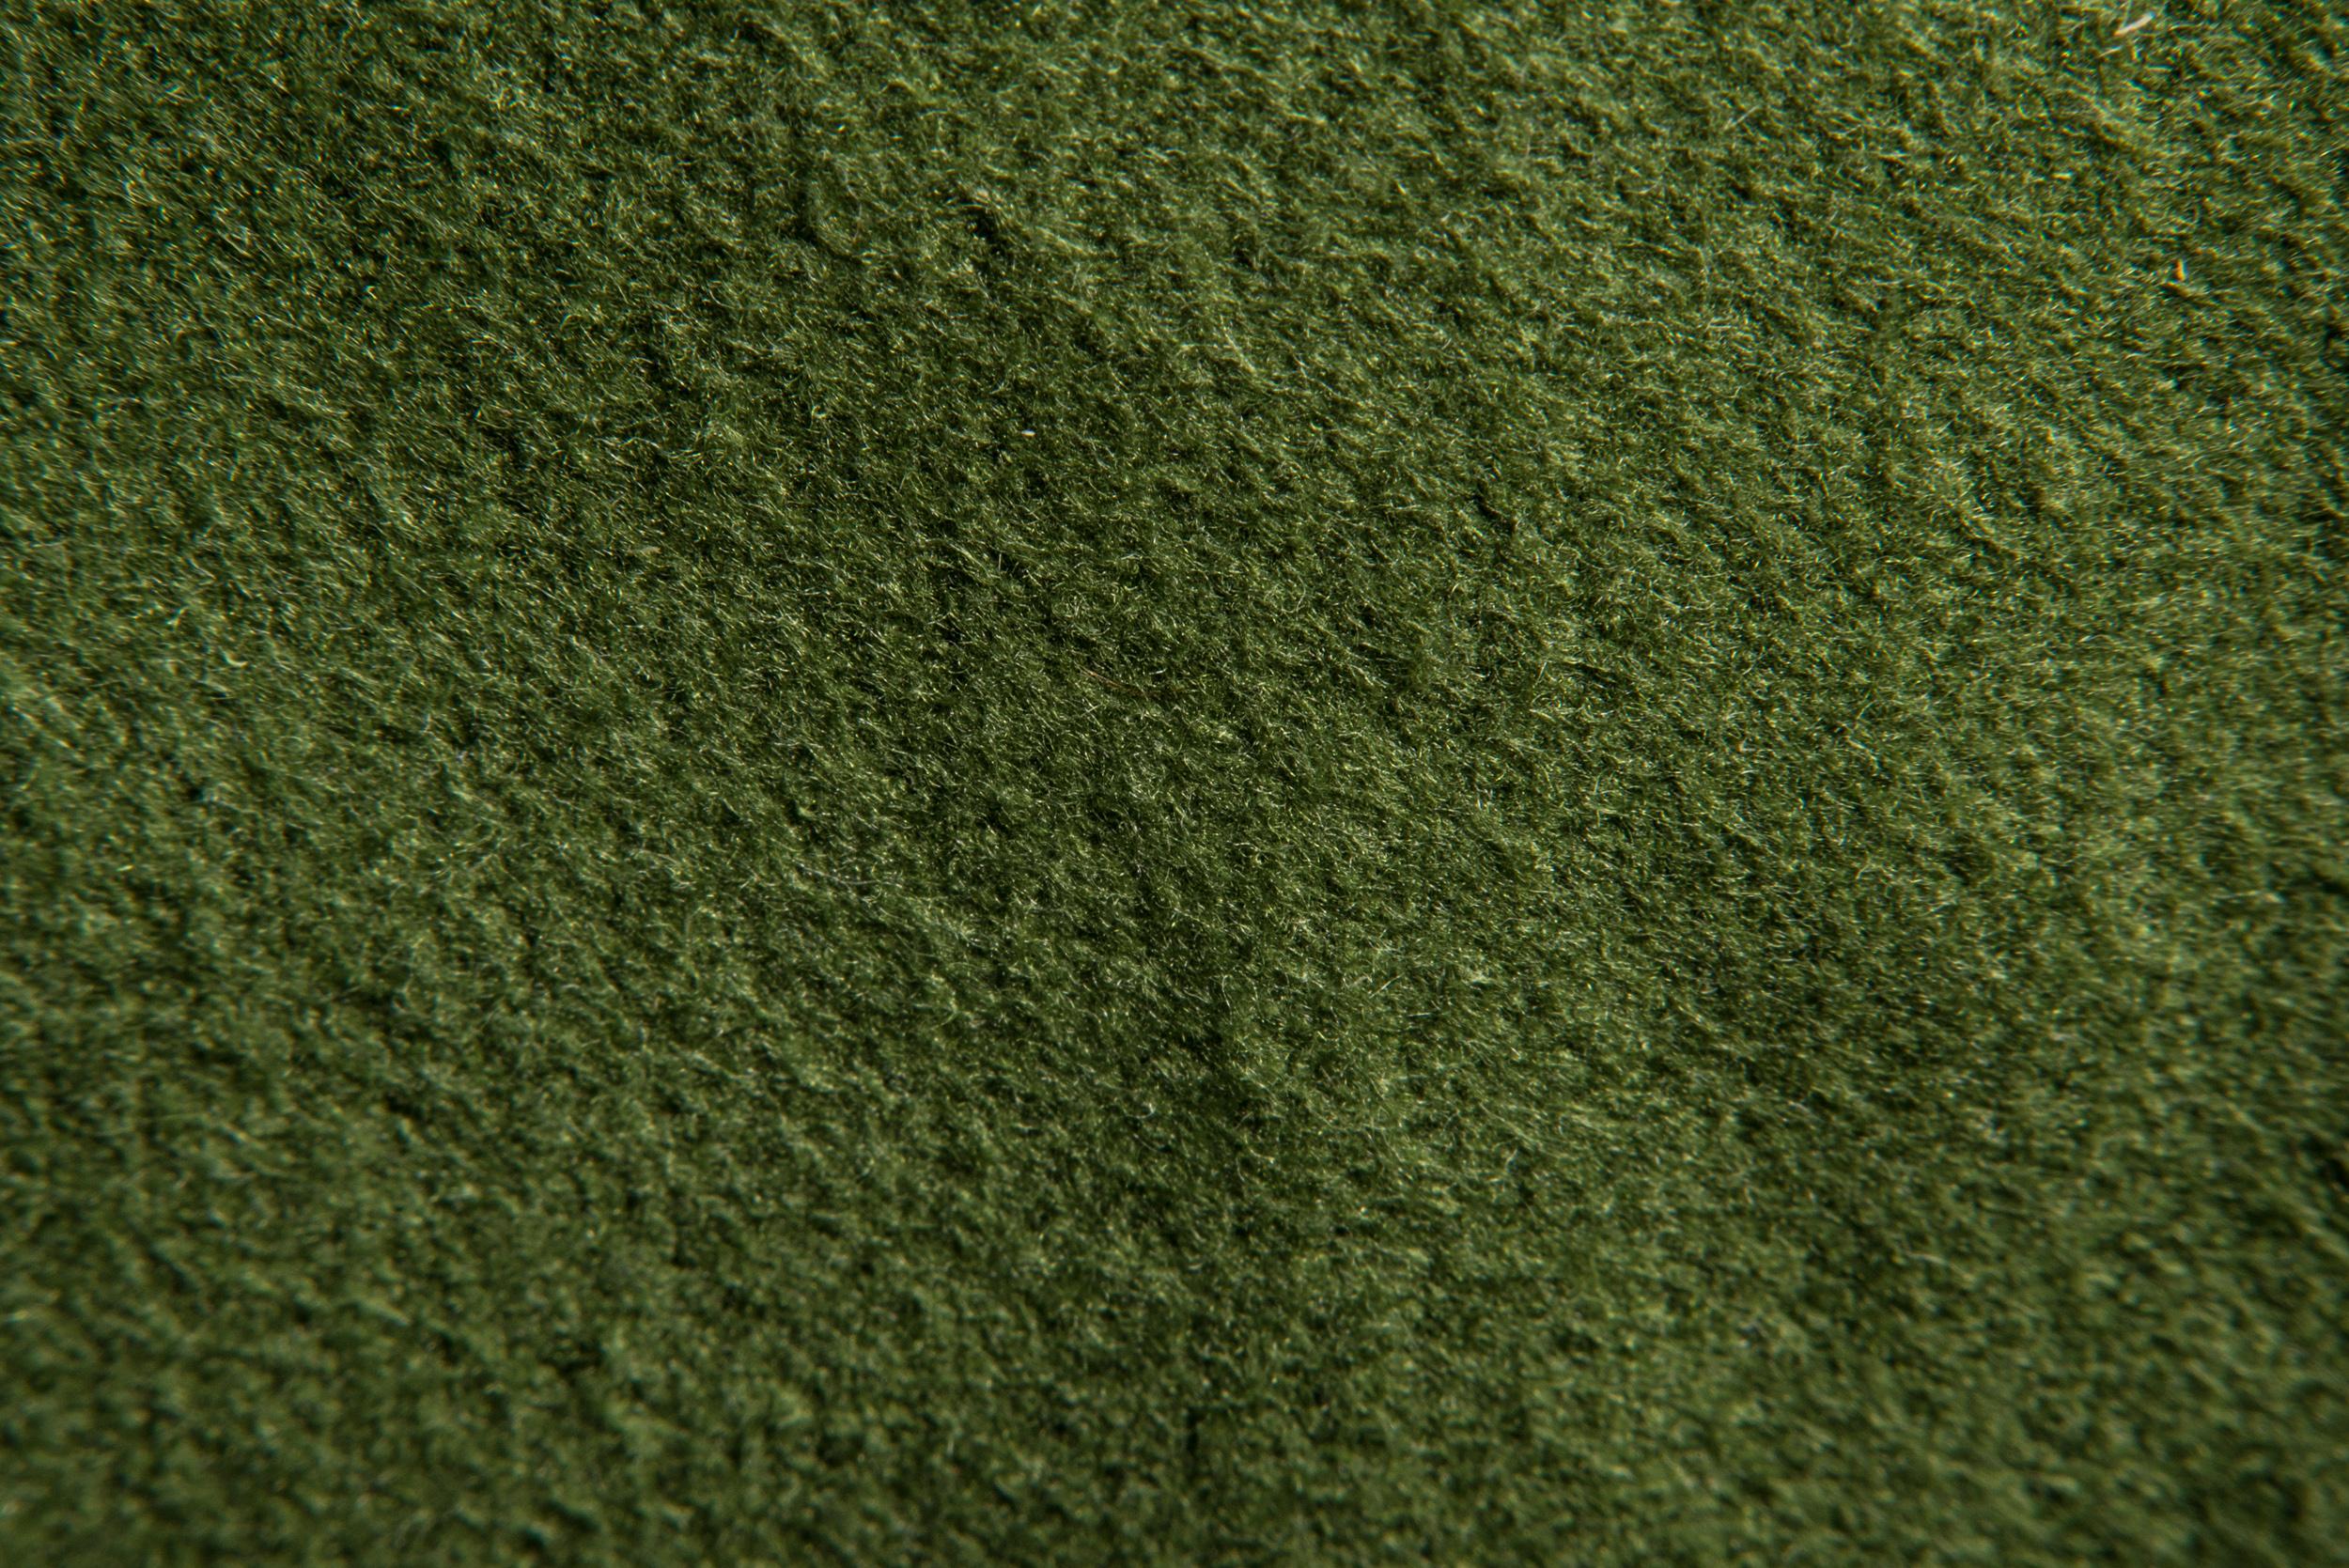 Macro Photograph of Microfiber Absorbent Towel